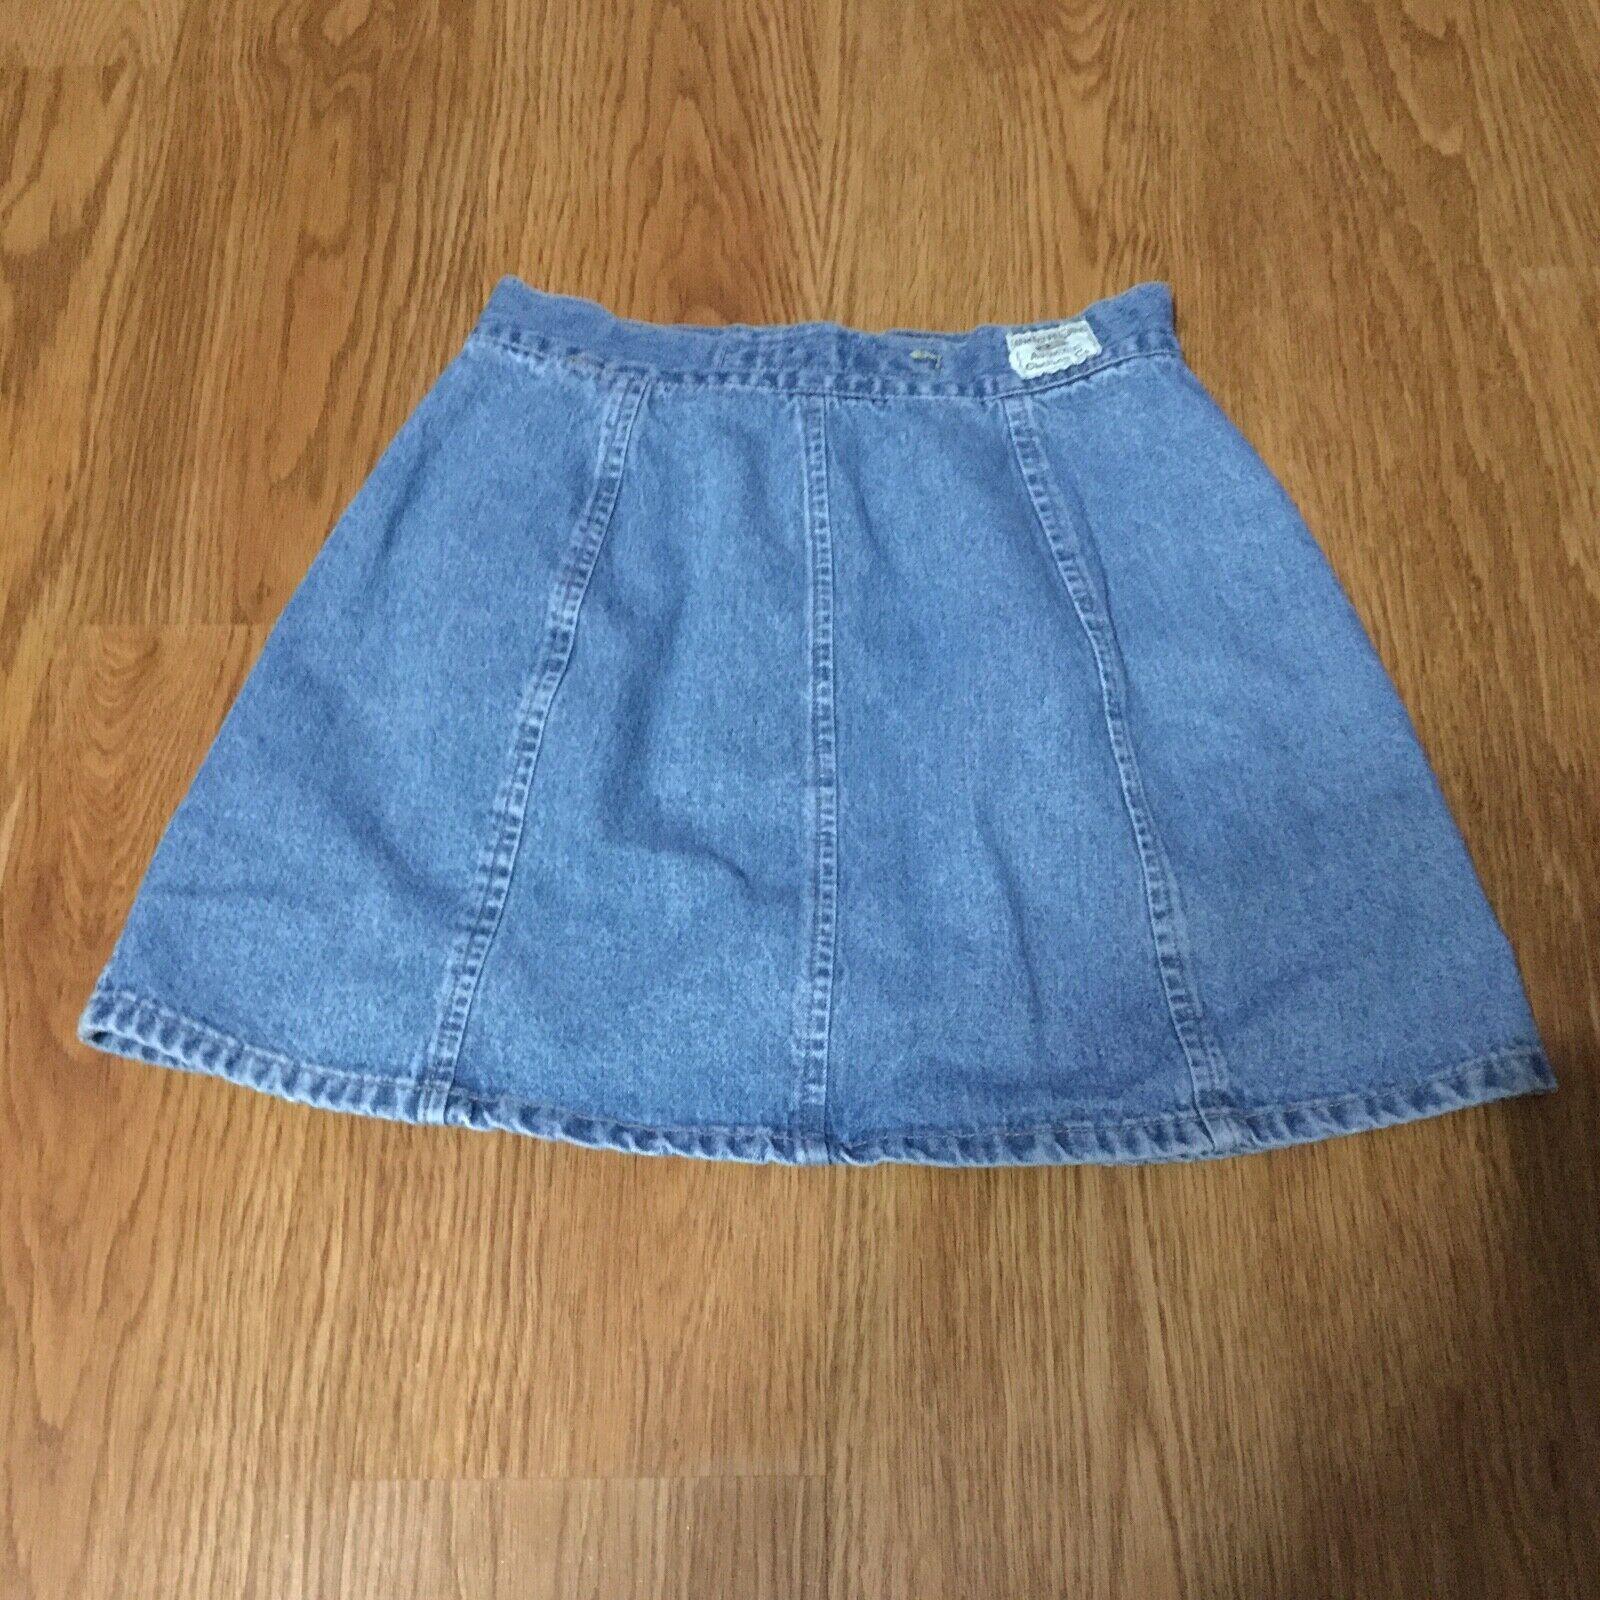 Vintage Unionbay Denim Mini Skirt Juniors Size 3 … - image 3